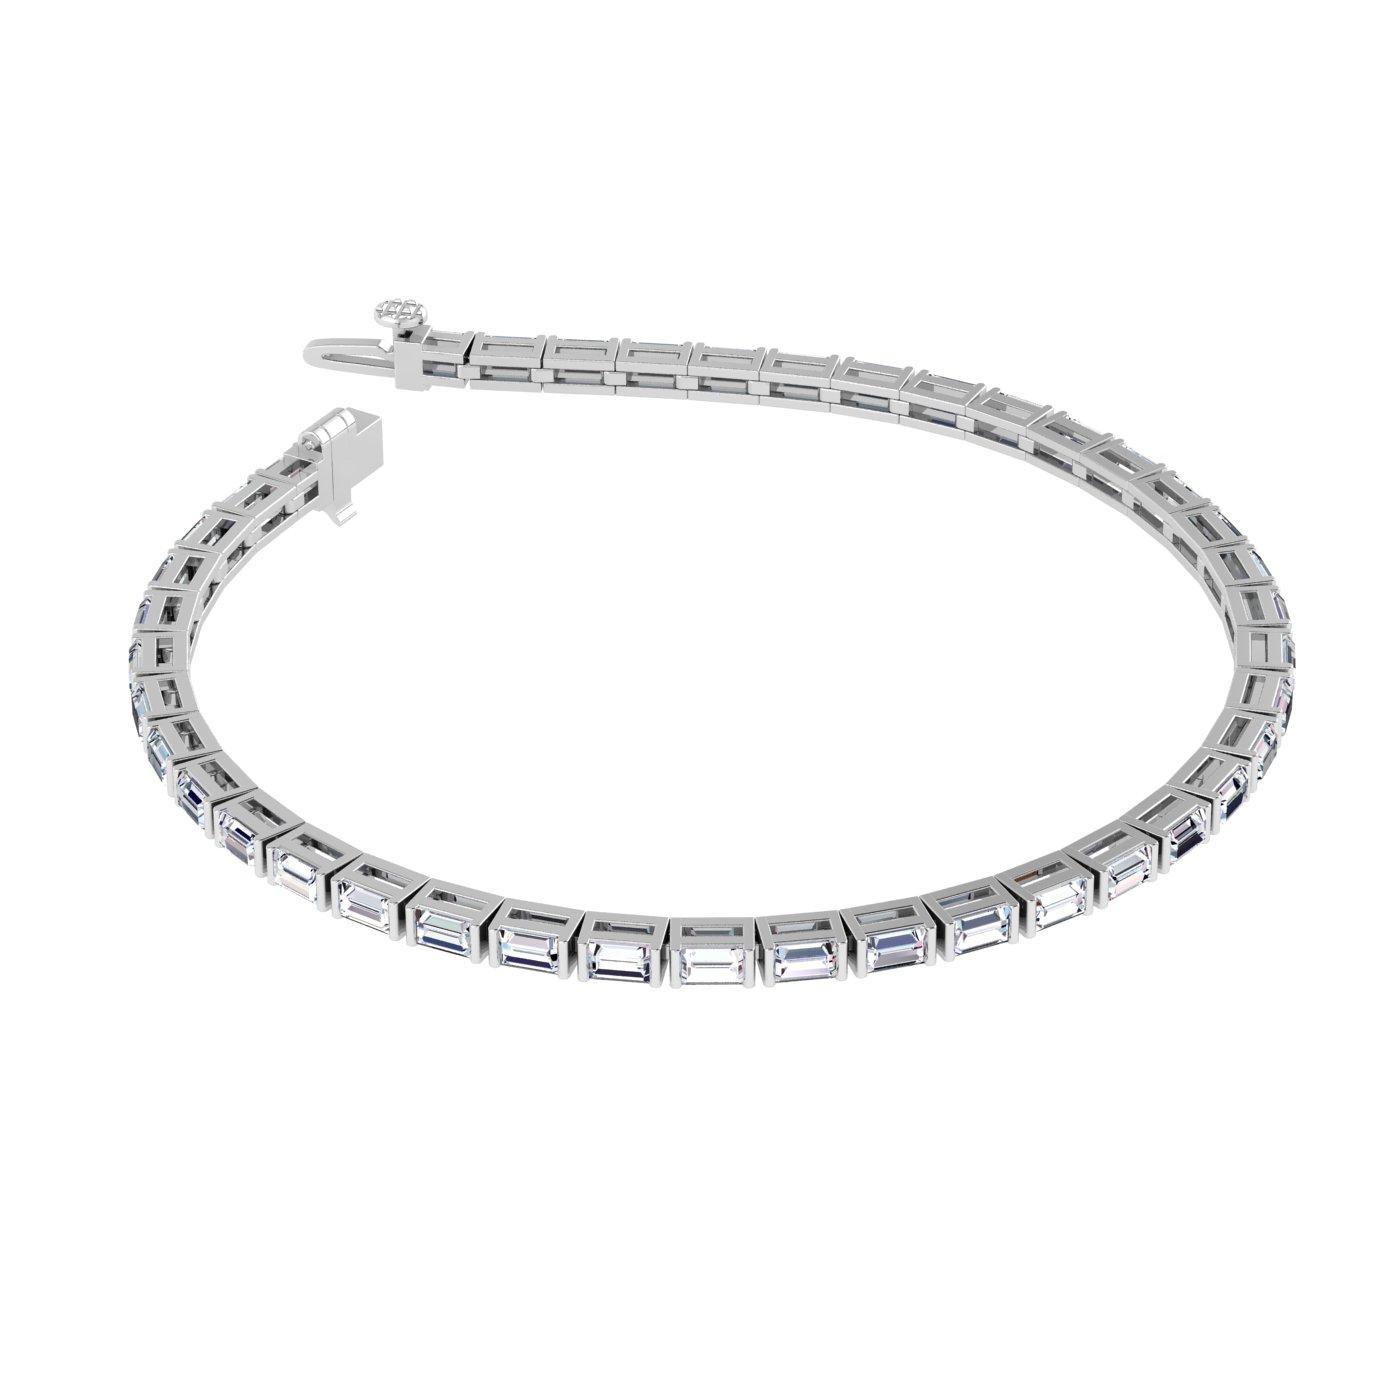 Brooke 14K White Gold Lab Grown Diamond Baguette Tennis Bracelet (2 1/2 TCW)